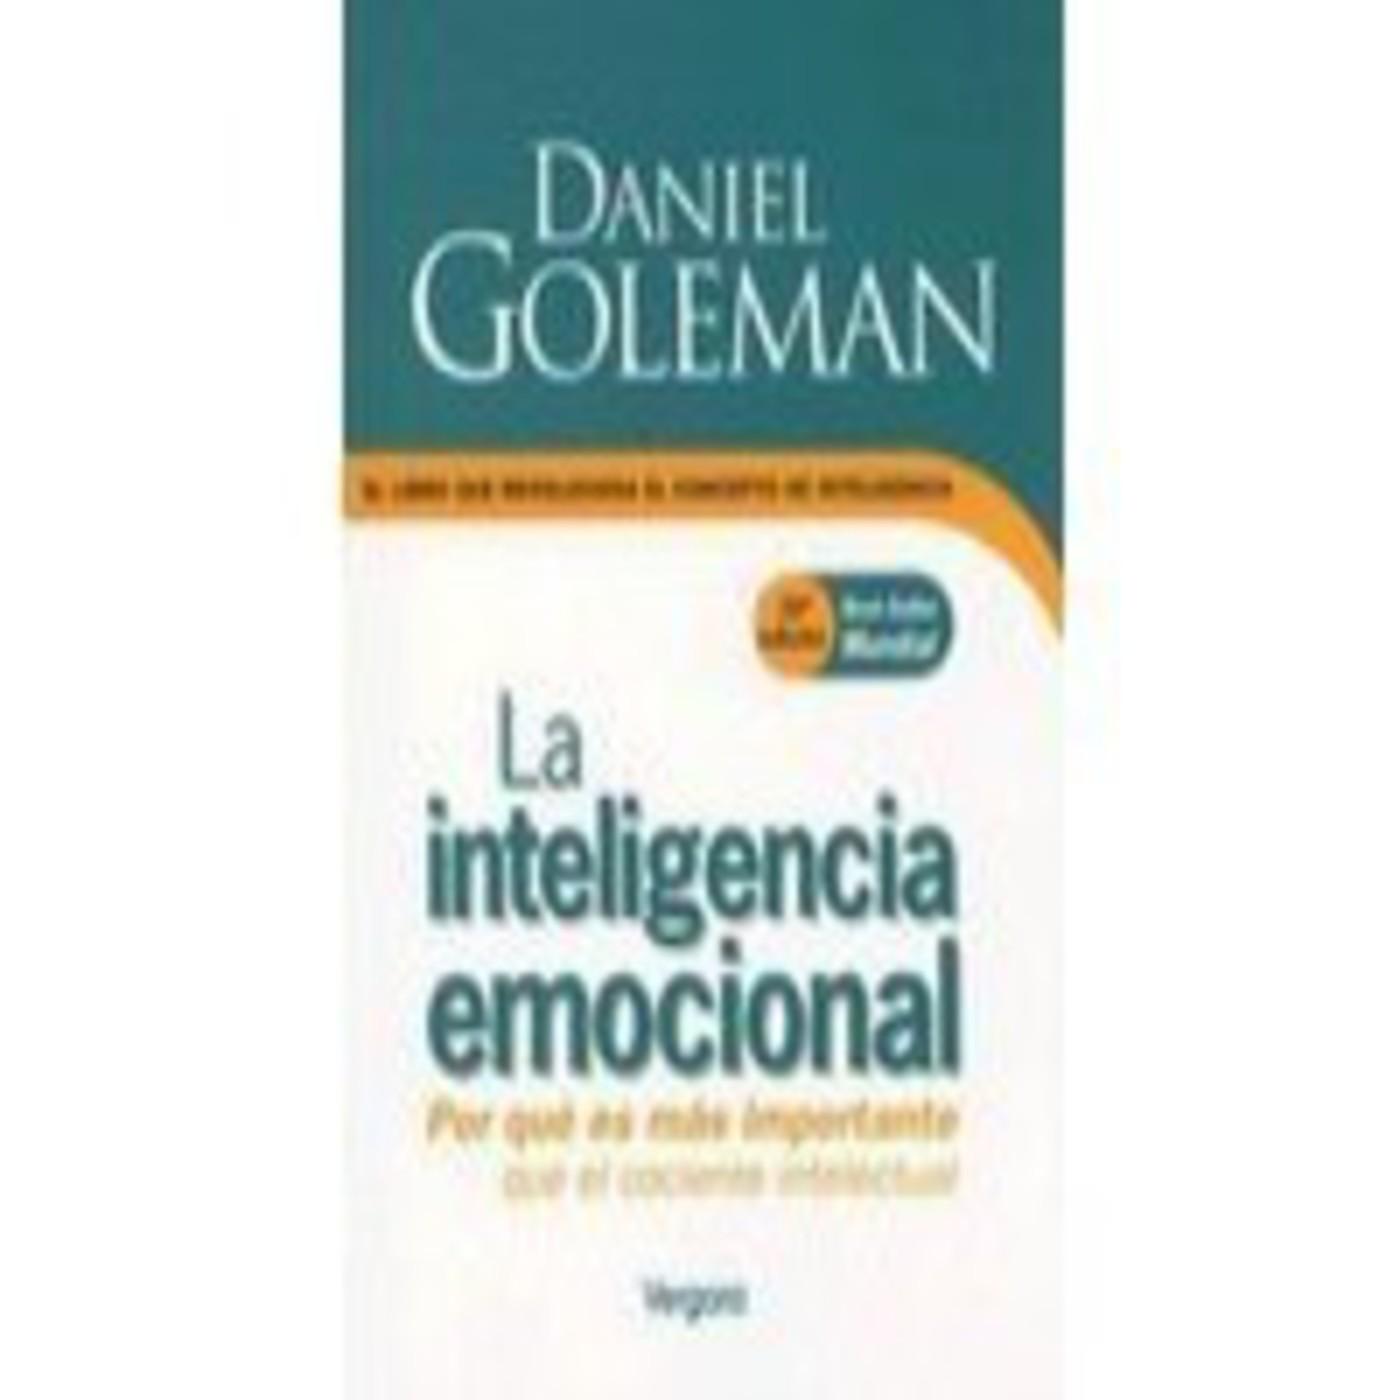 32..INTELIGENCIA EMOCIONAL, Daniel Goleman